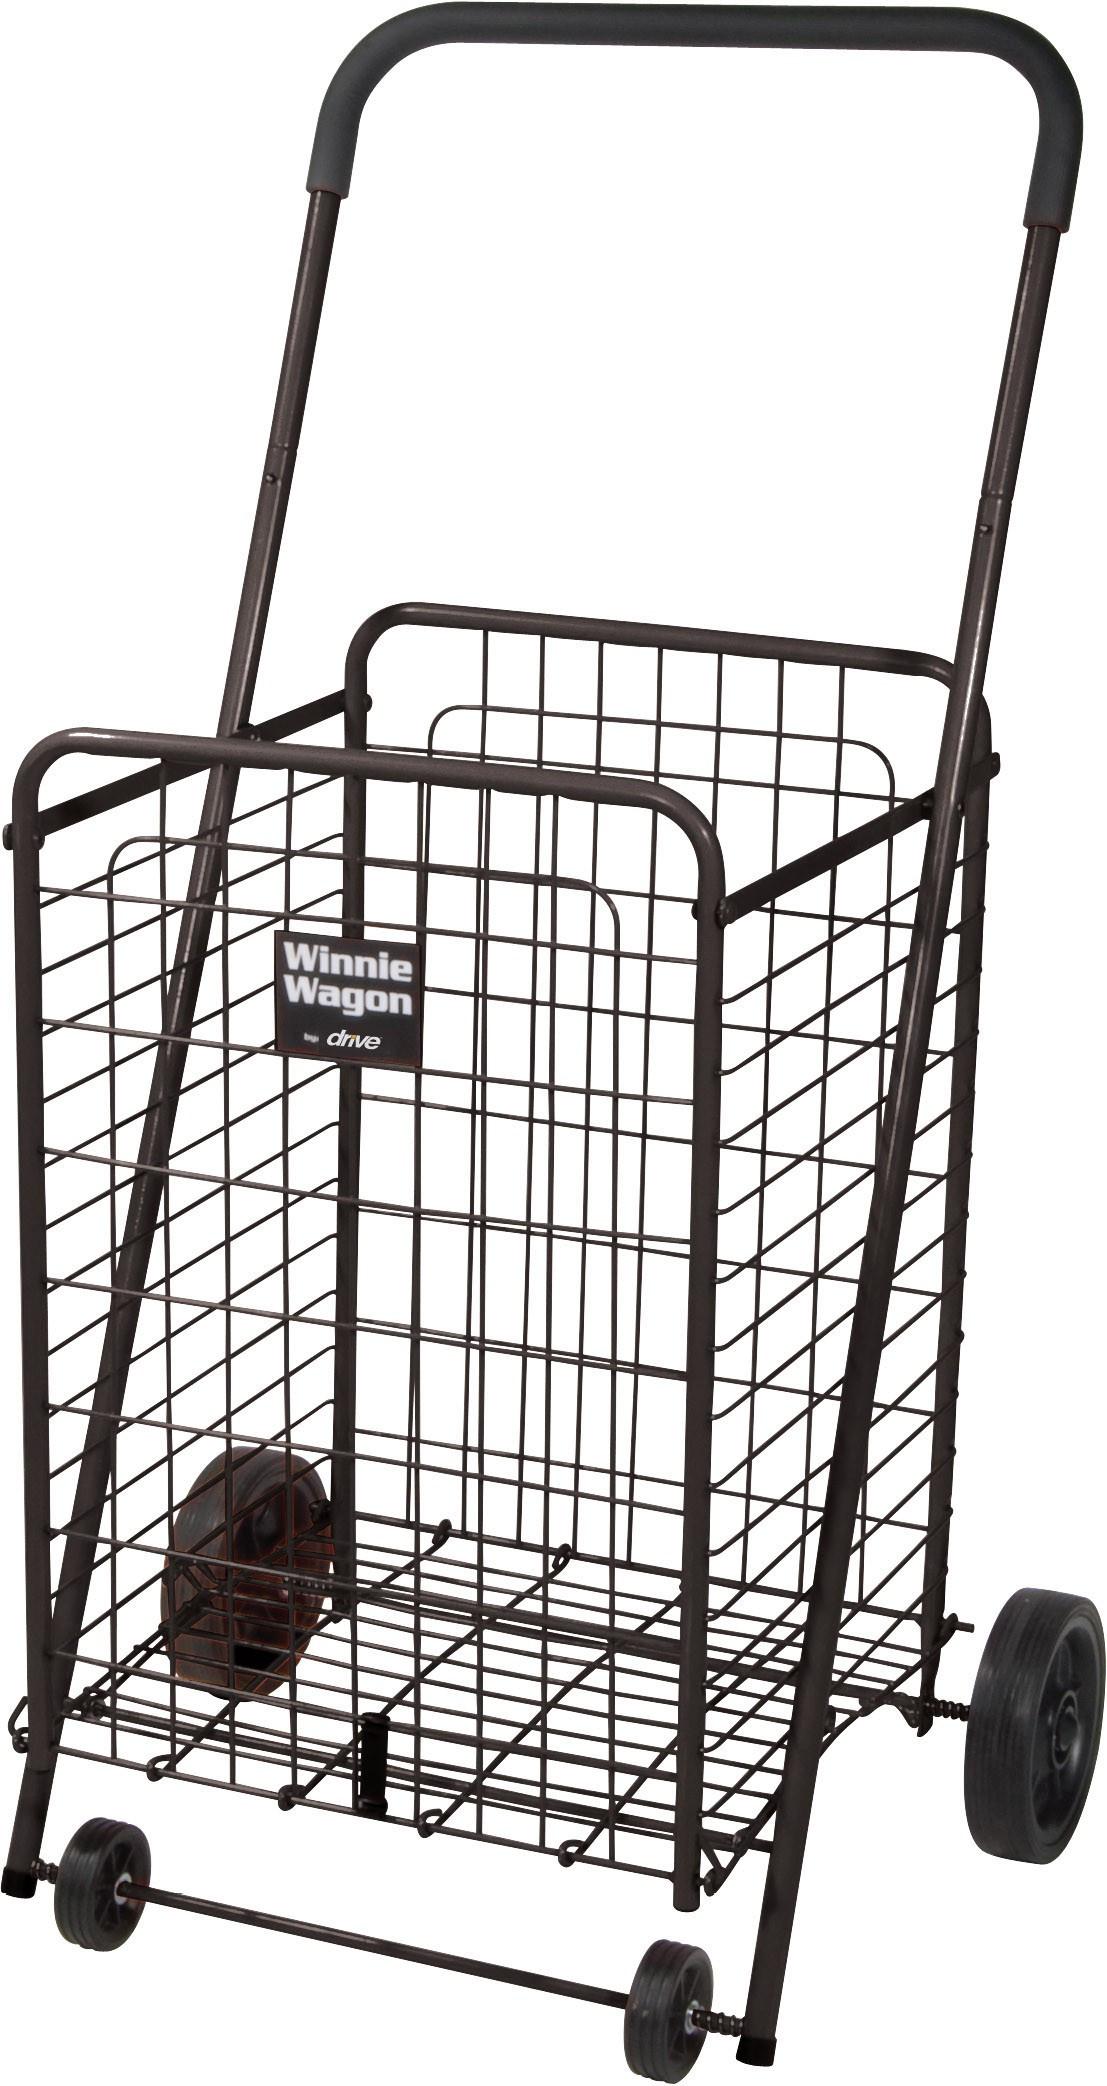 Winnie Wagon with Adjustable Handle Height - Black